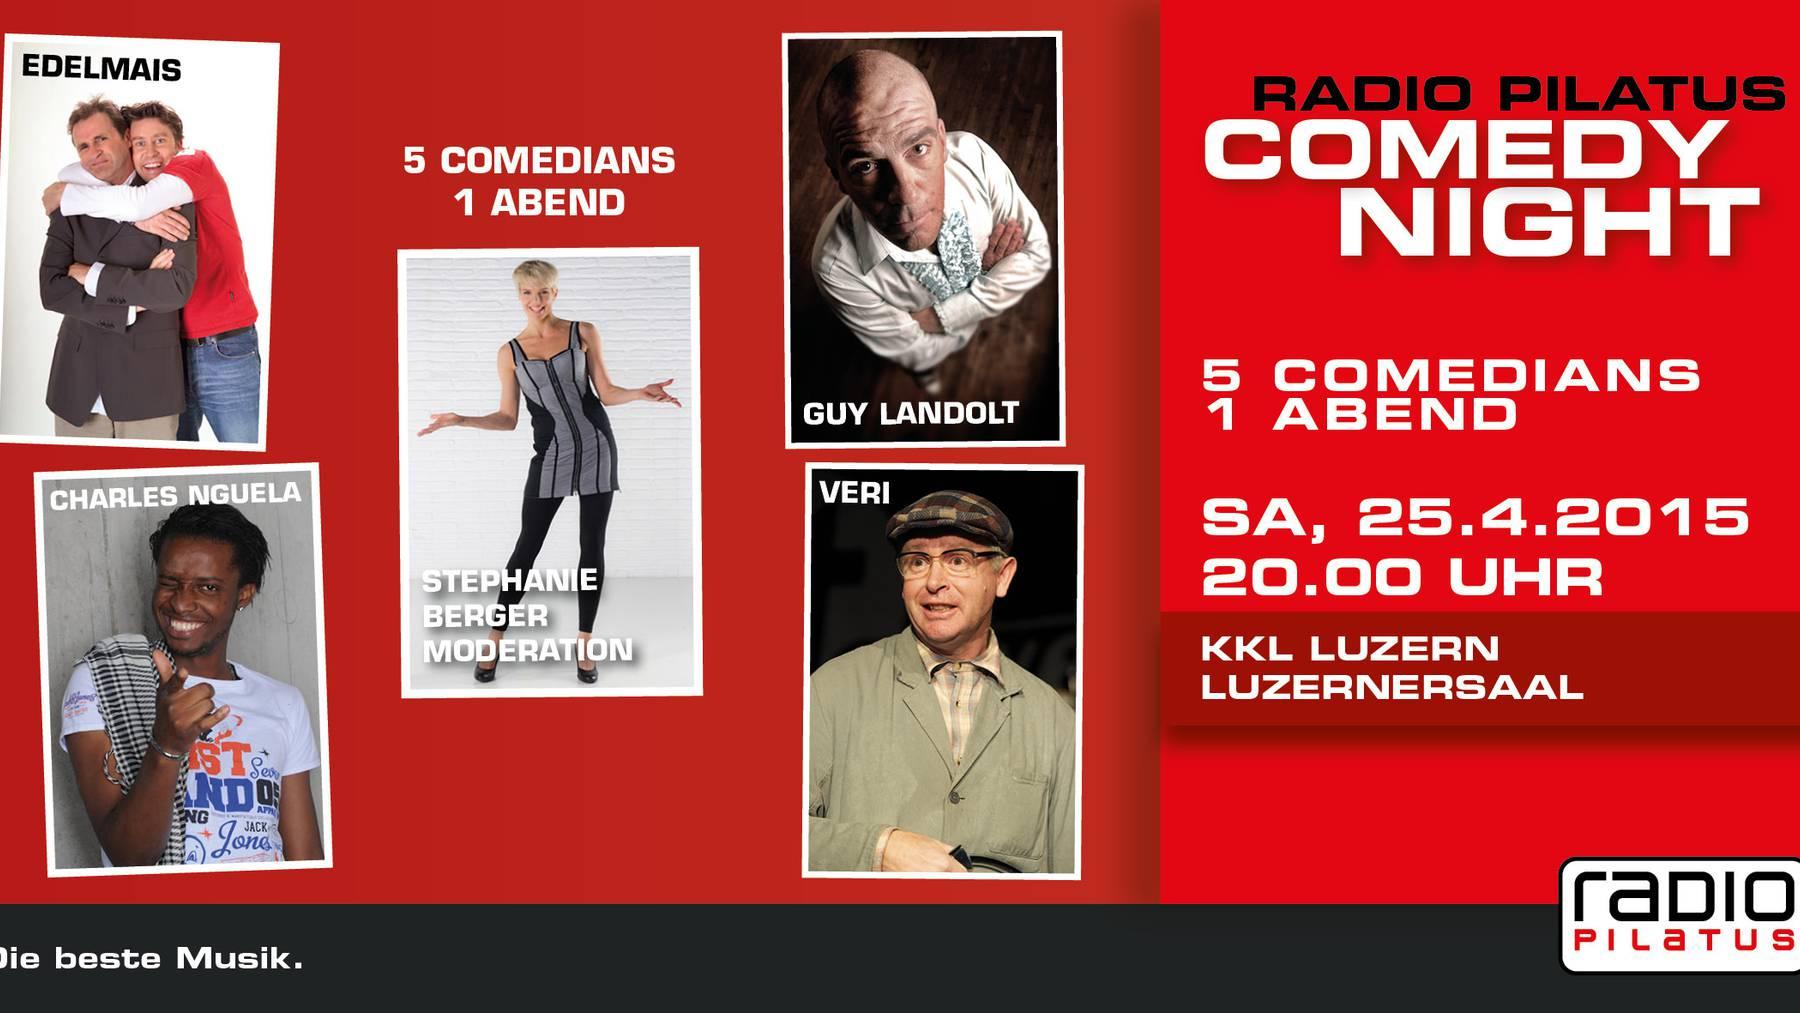 Radio Pilatus Comedy Night - Samstag, 25. April 2015